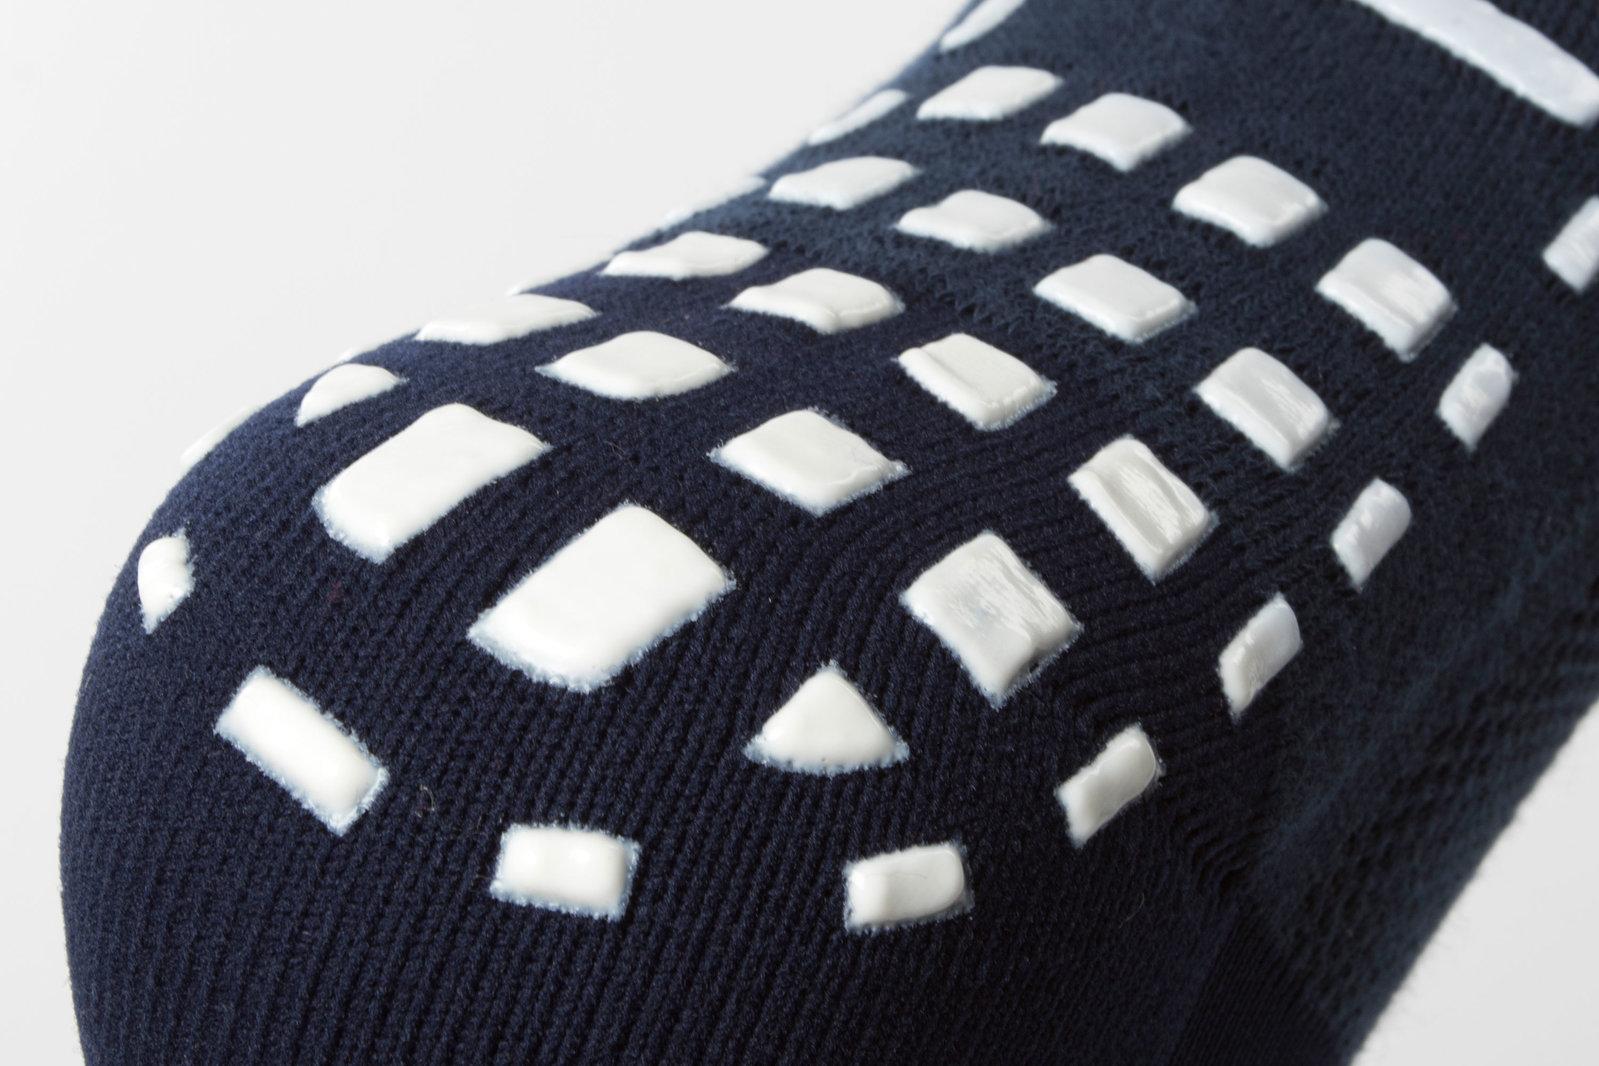 Atak Sports Grippy Non Slip Long Grip Socks Accessory Workout Sports Training